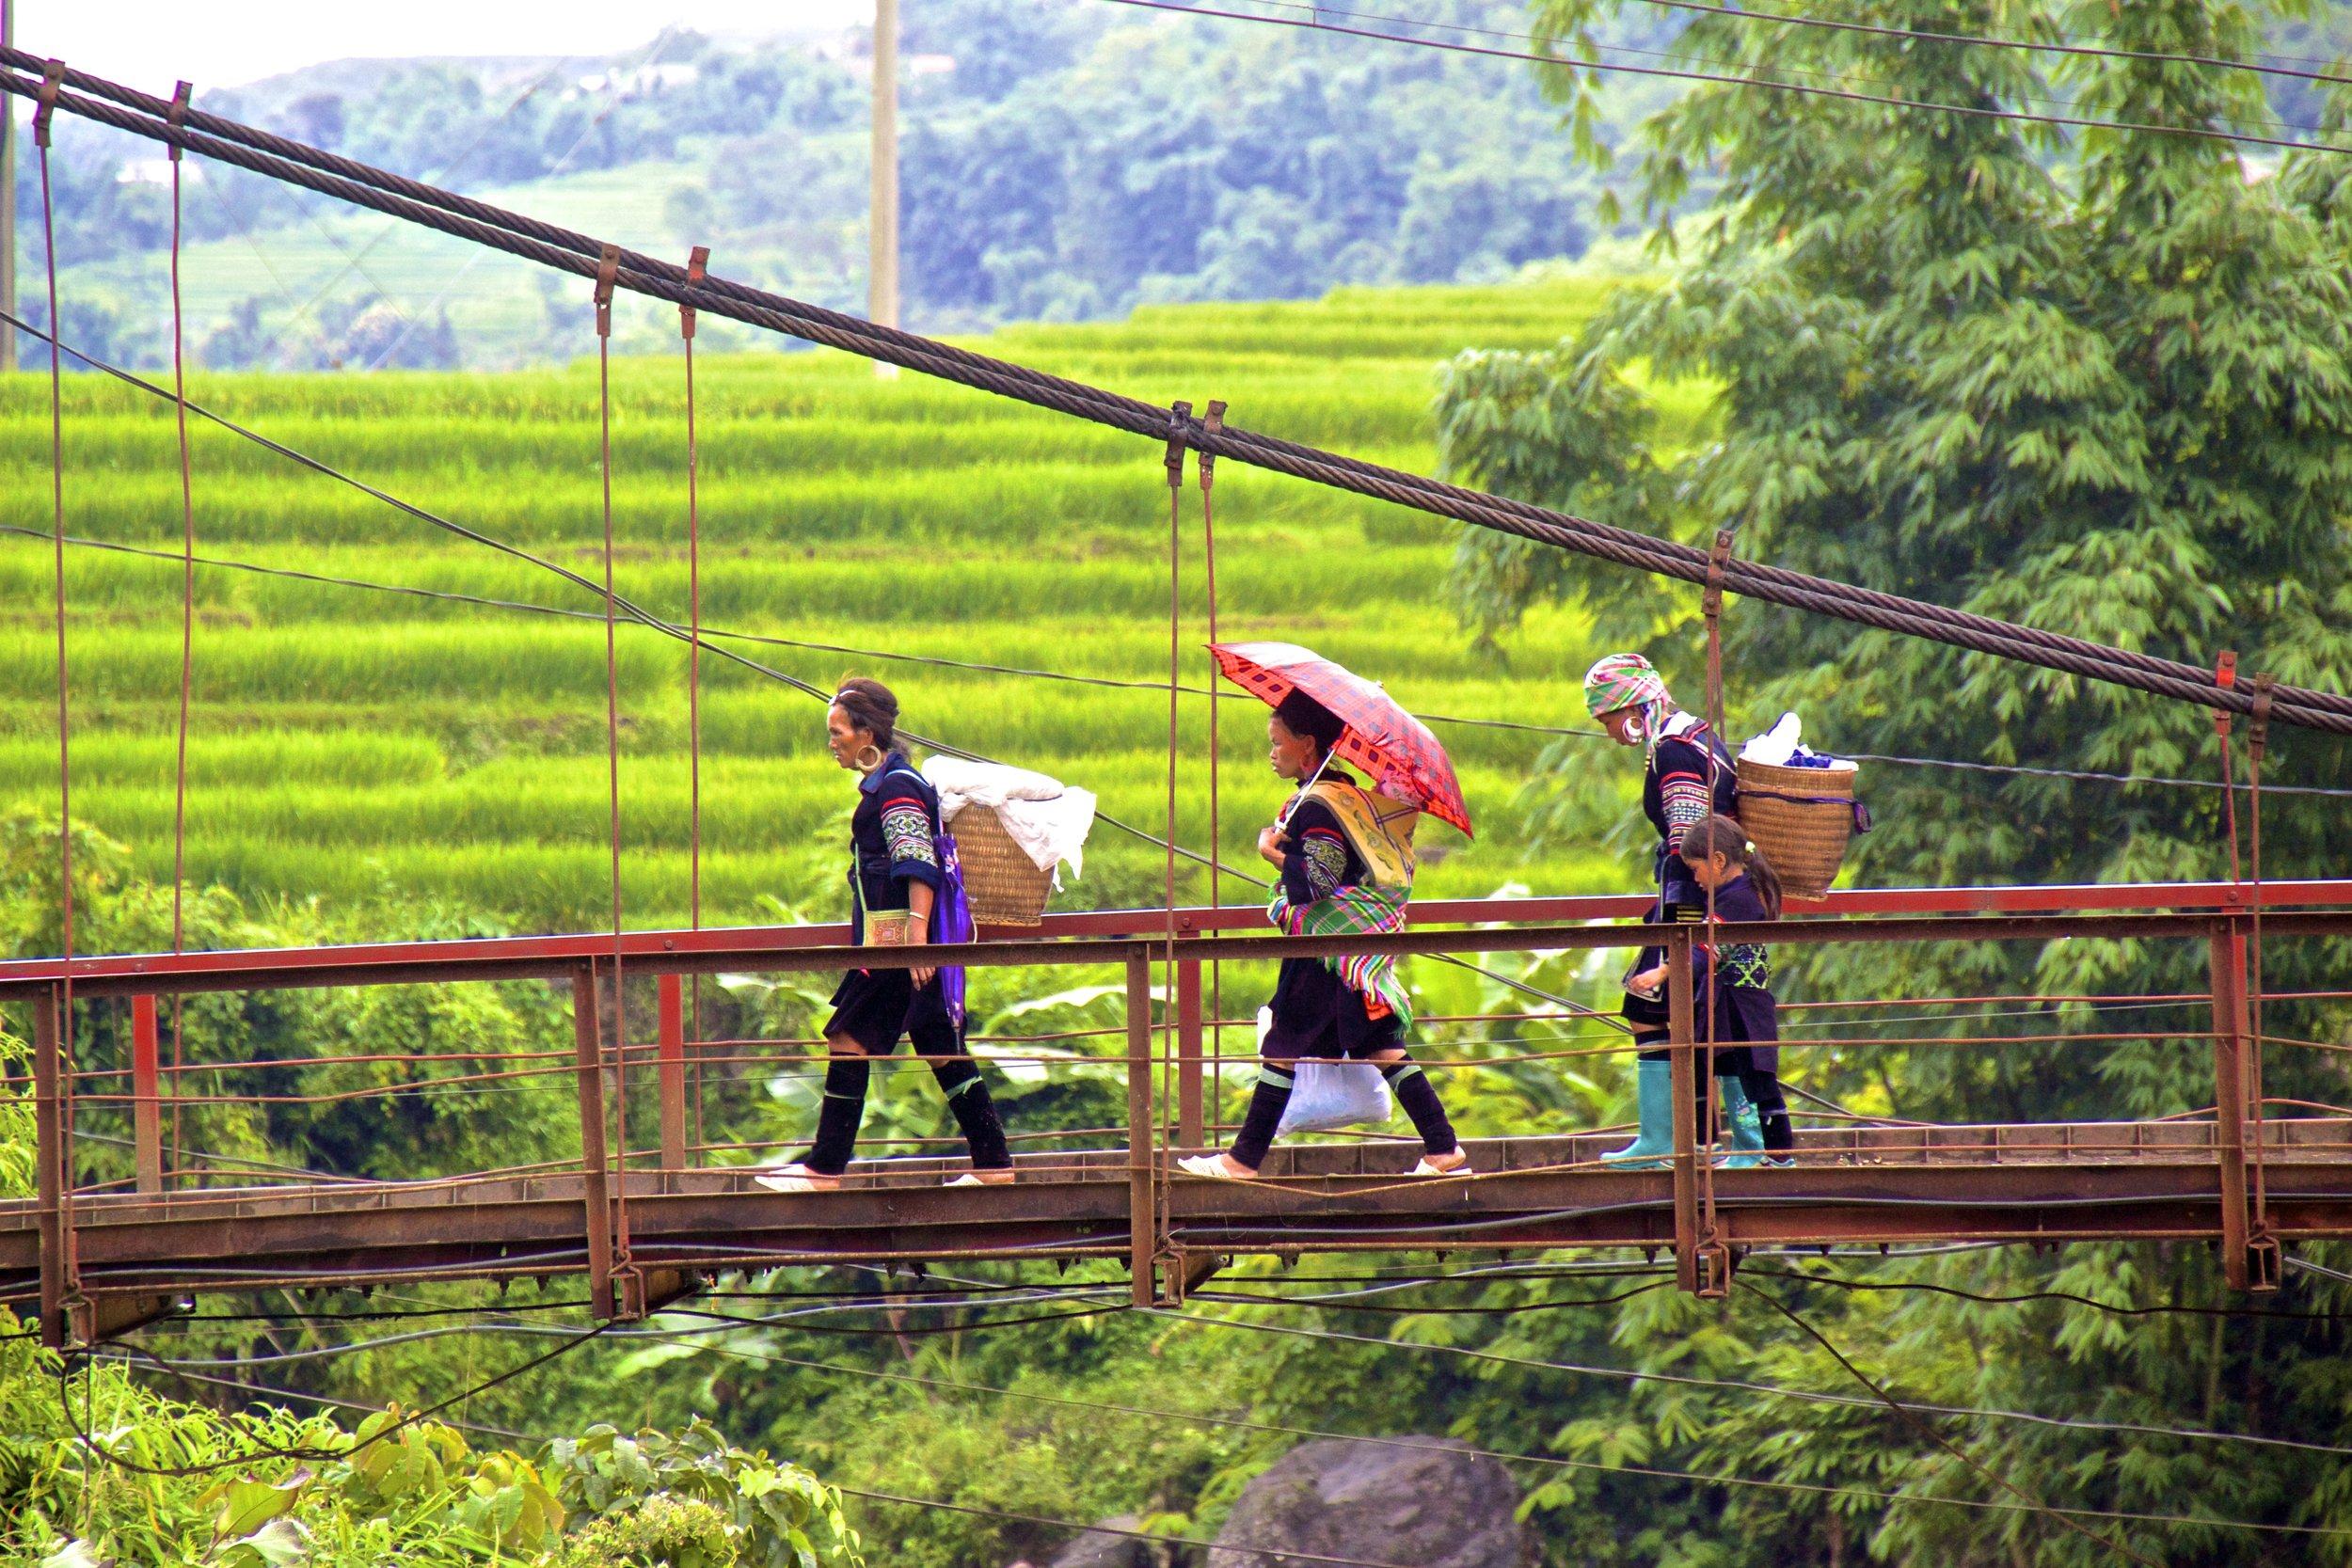 sa pa hmong people rice paddies 7.jpg